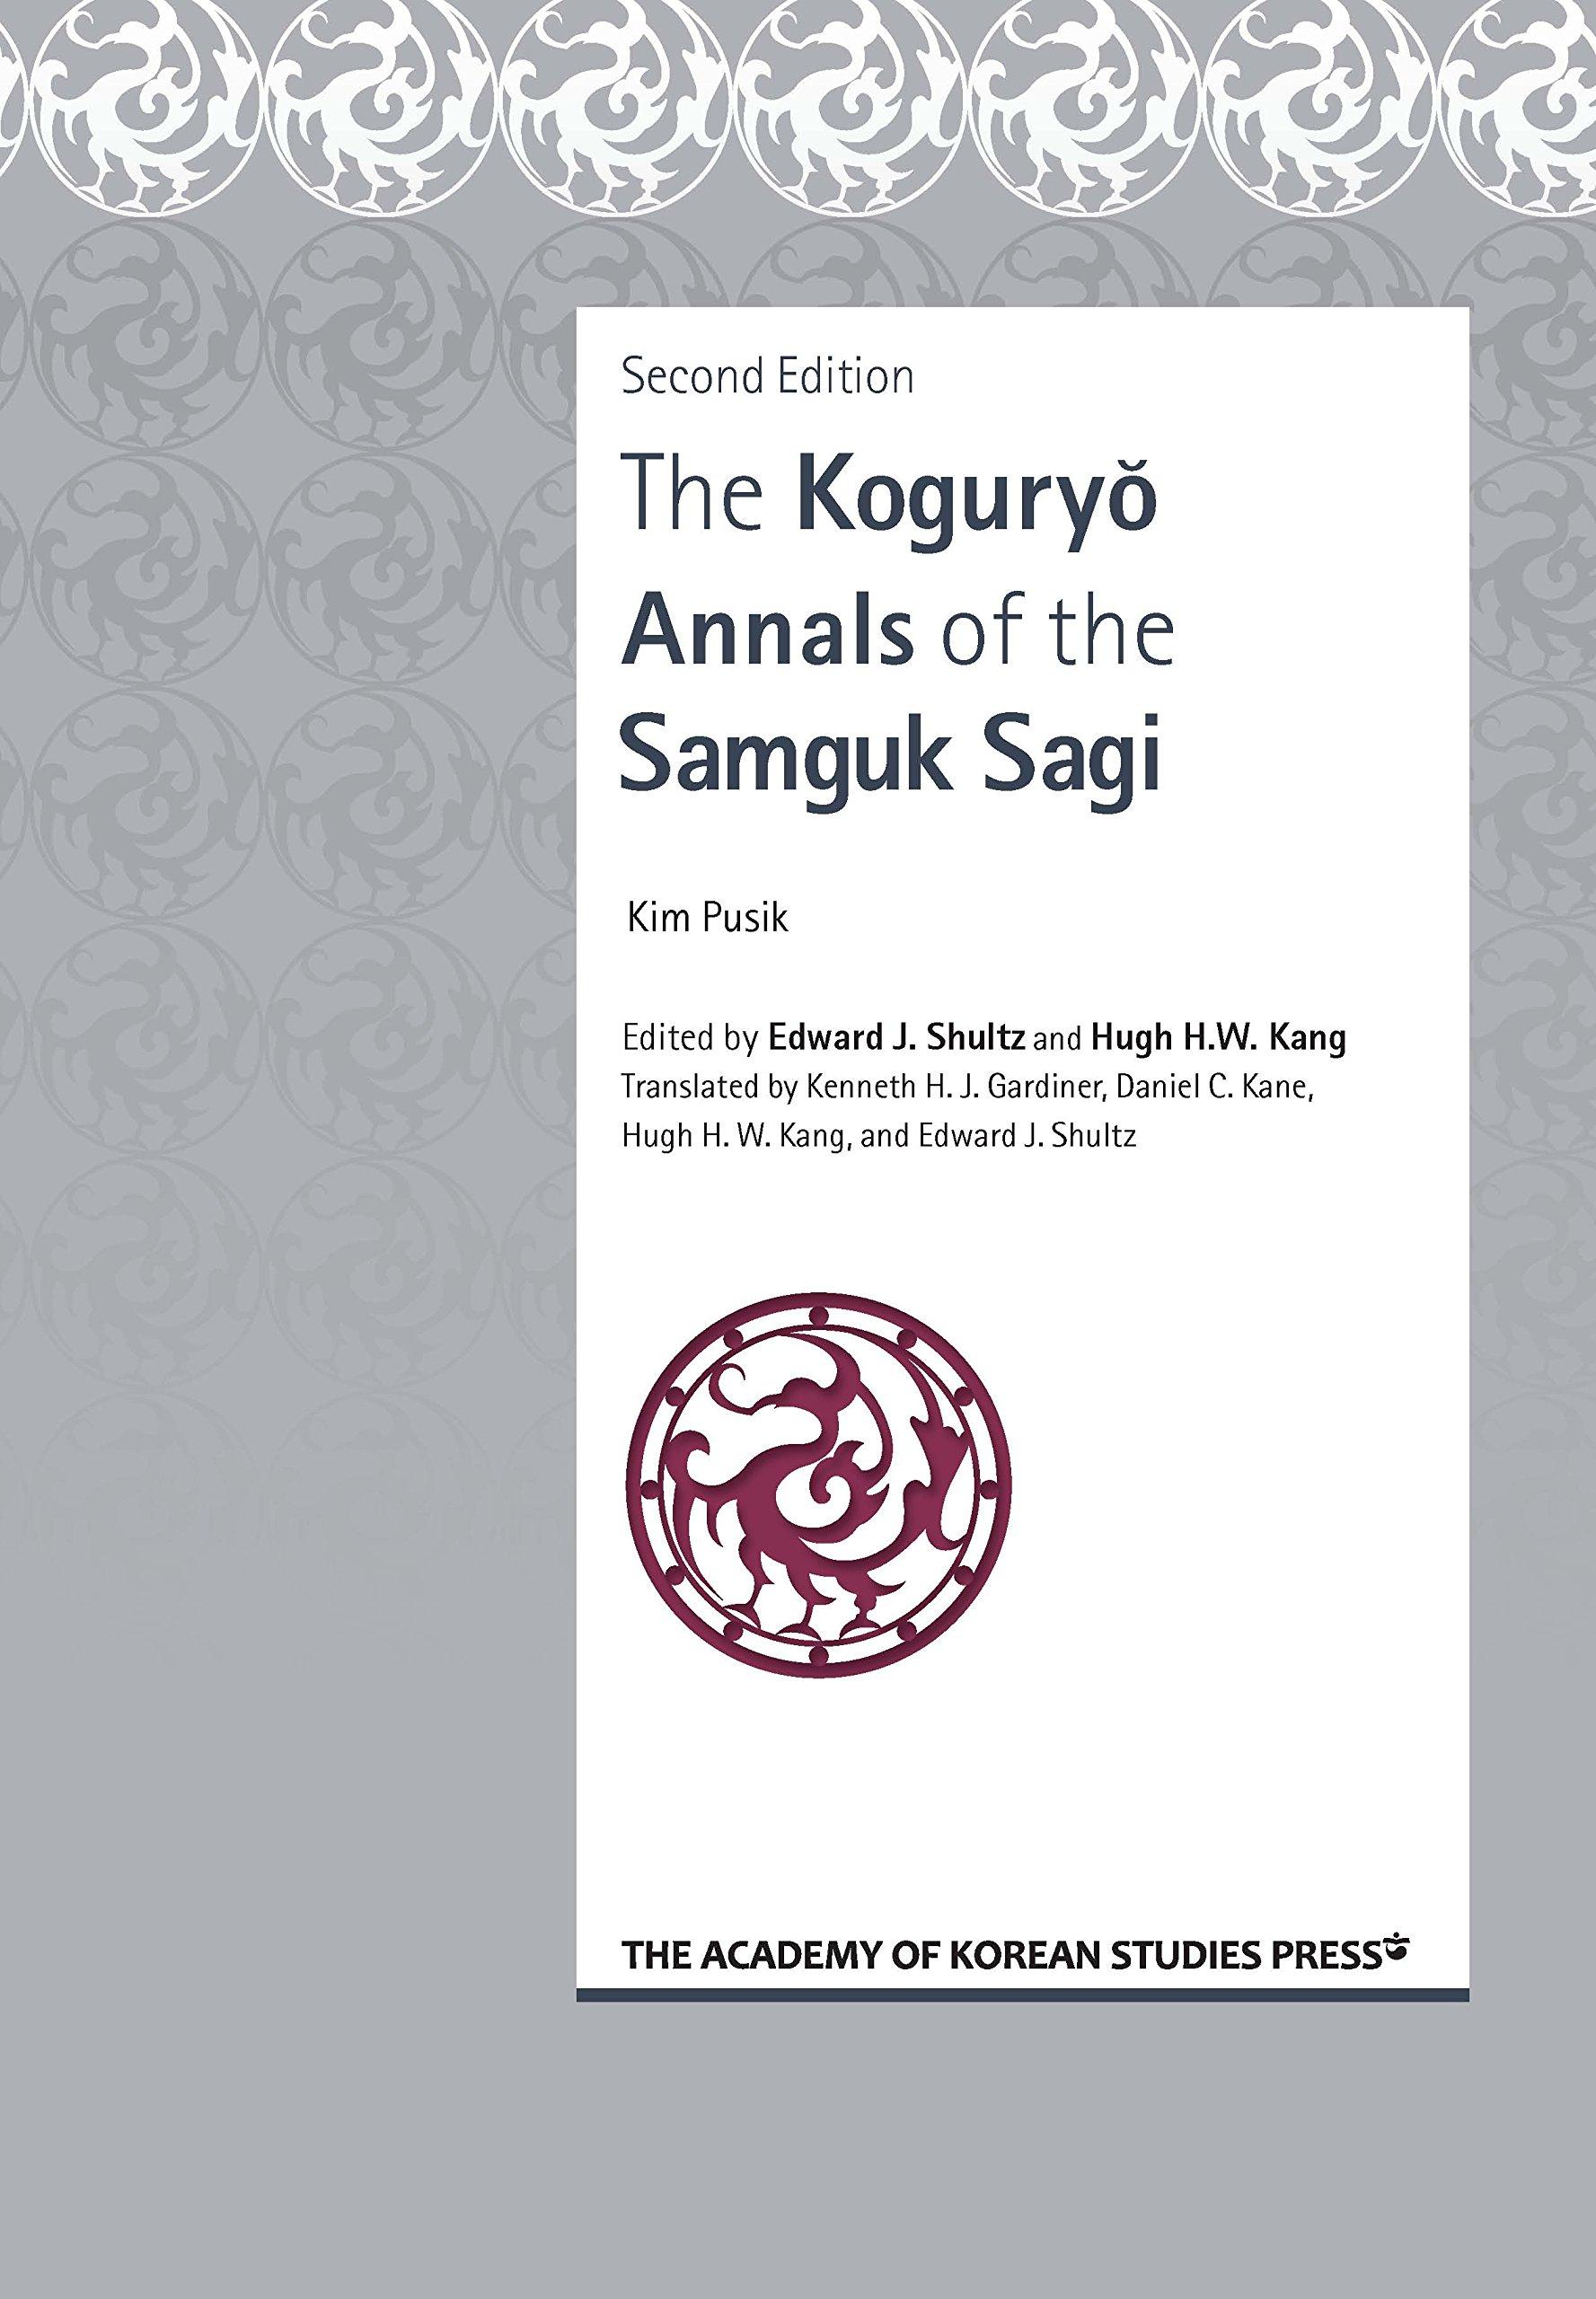 The Koguryo Annals of the Samguk Sagi: Translation by Edward J Shultz, Translation by Hugh H.W Kang: 9788971057919: Amazon.com: Books